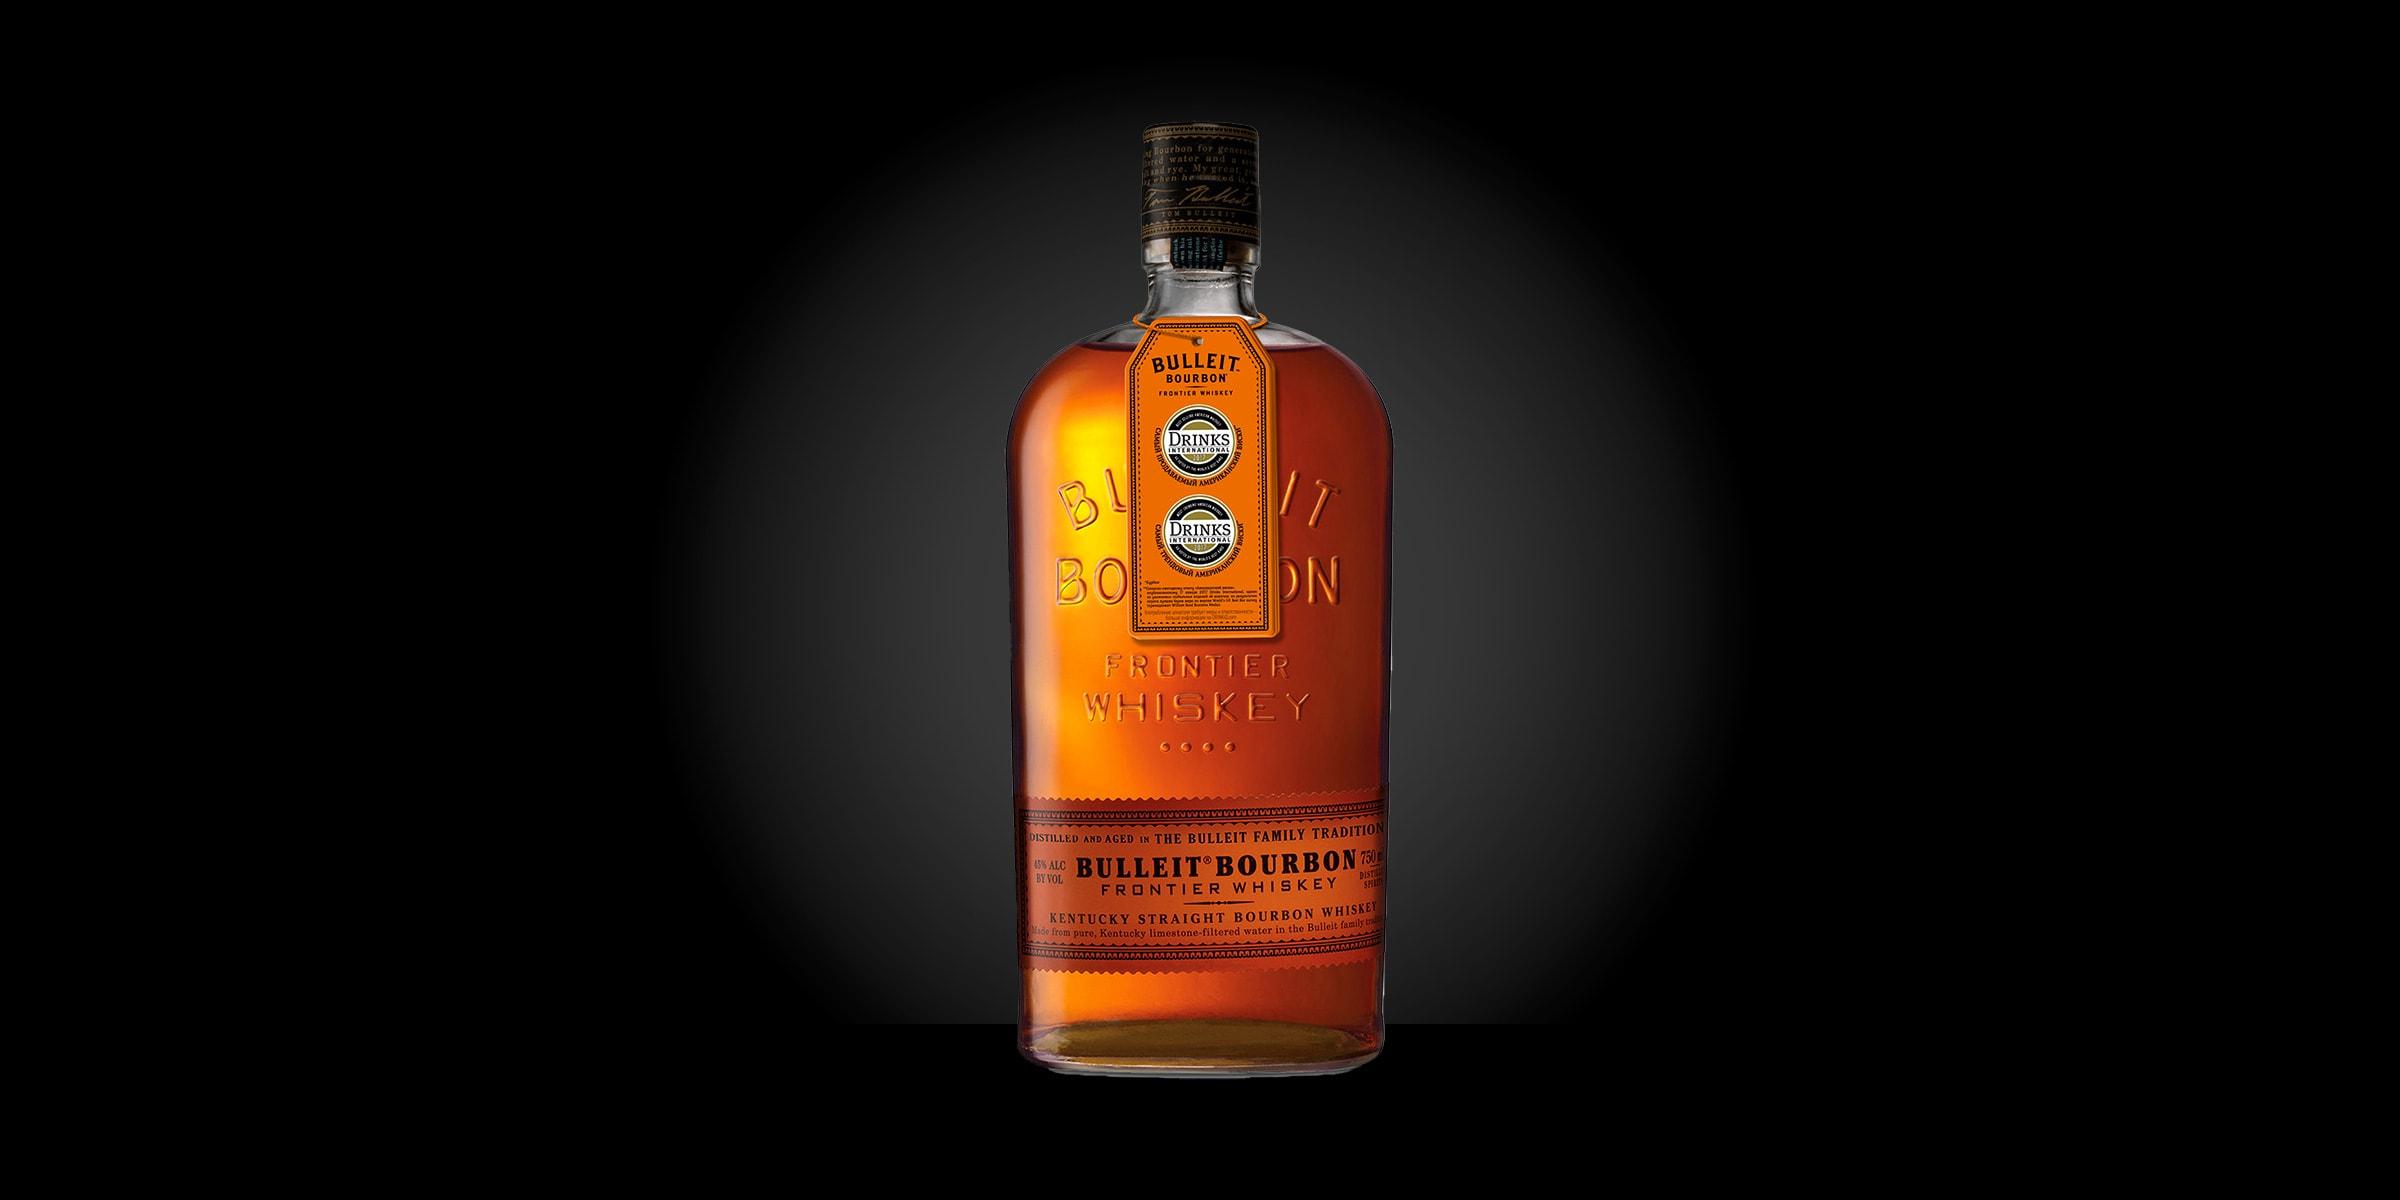 bulleit whiskey bottle price size Luxe Digital